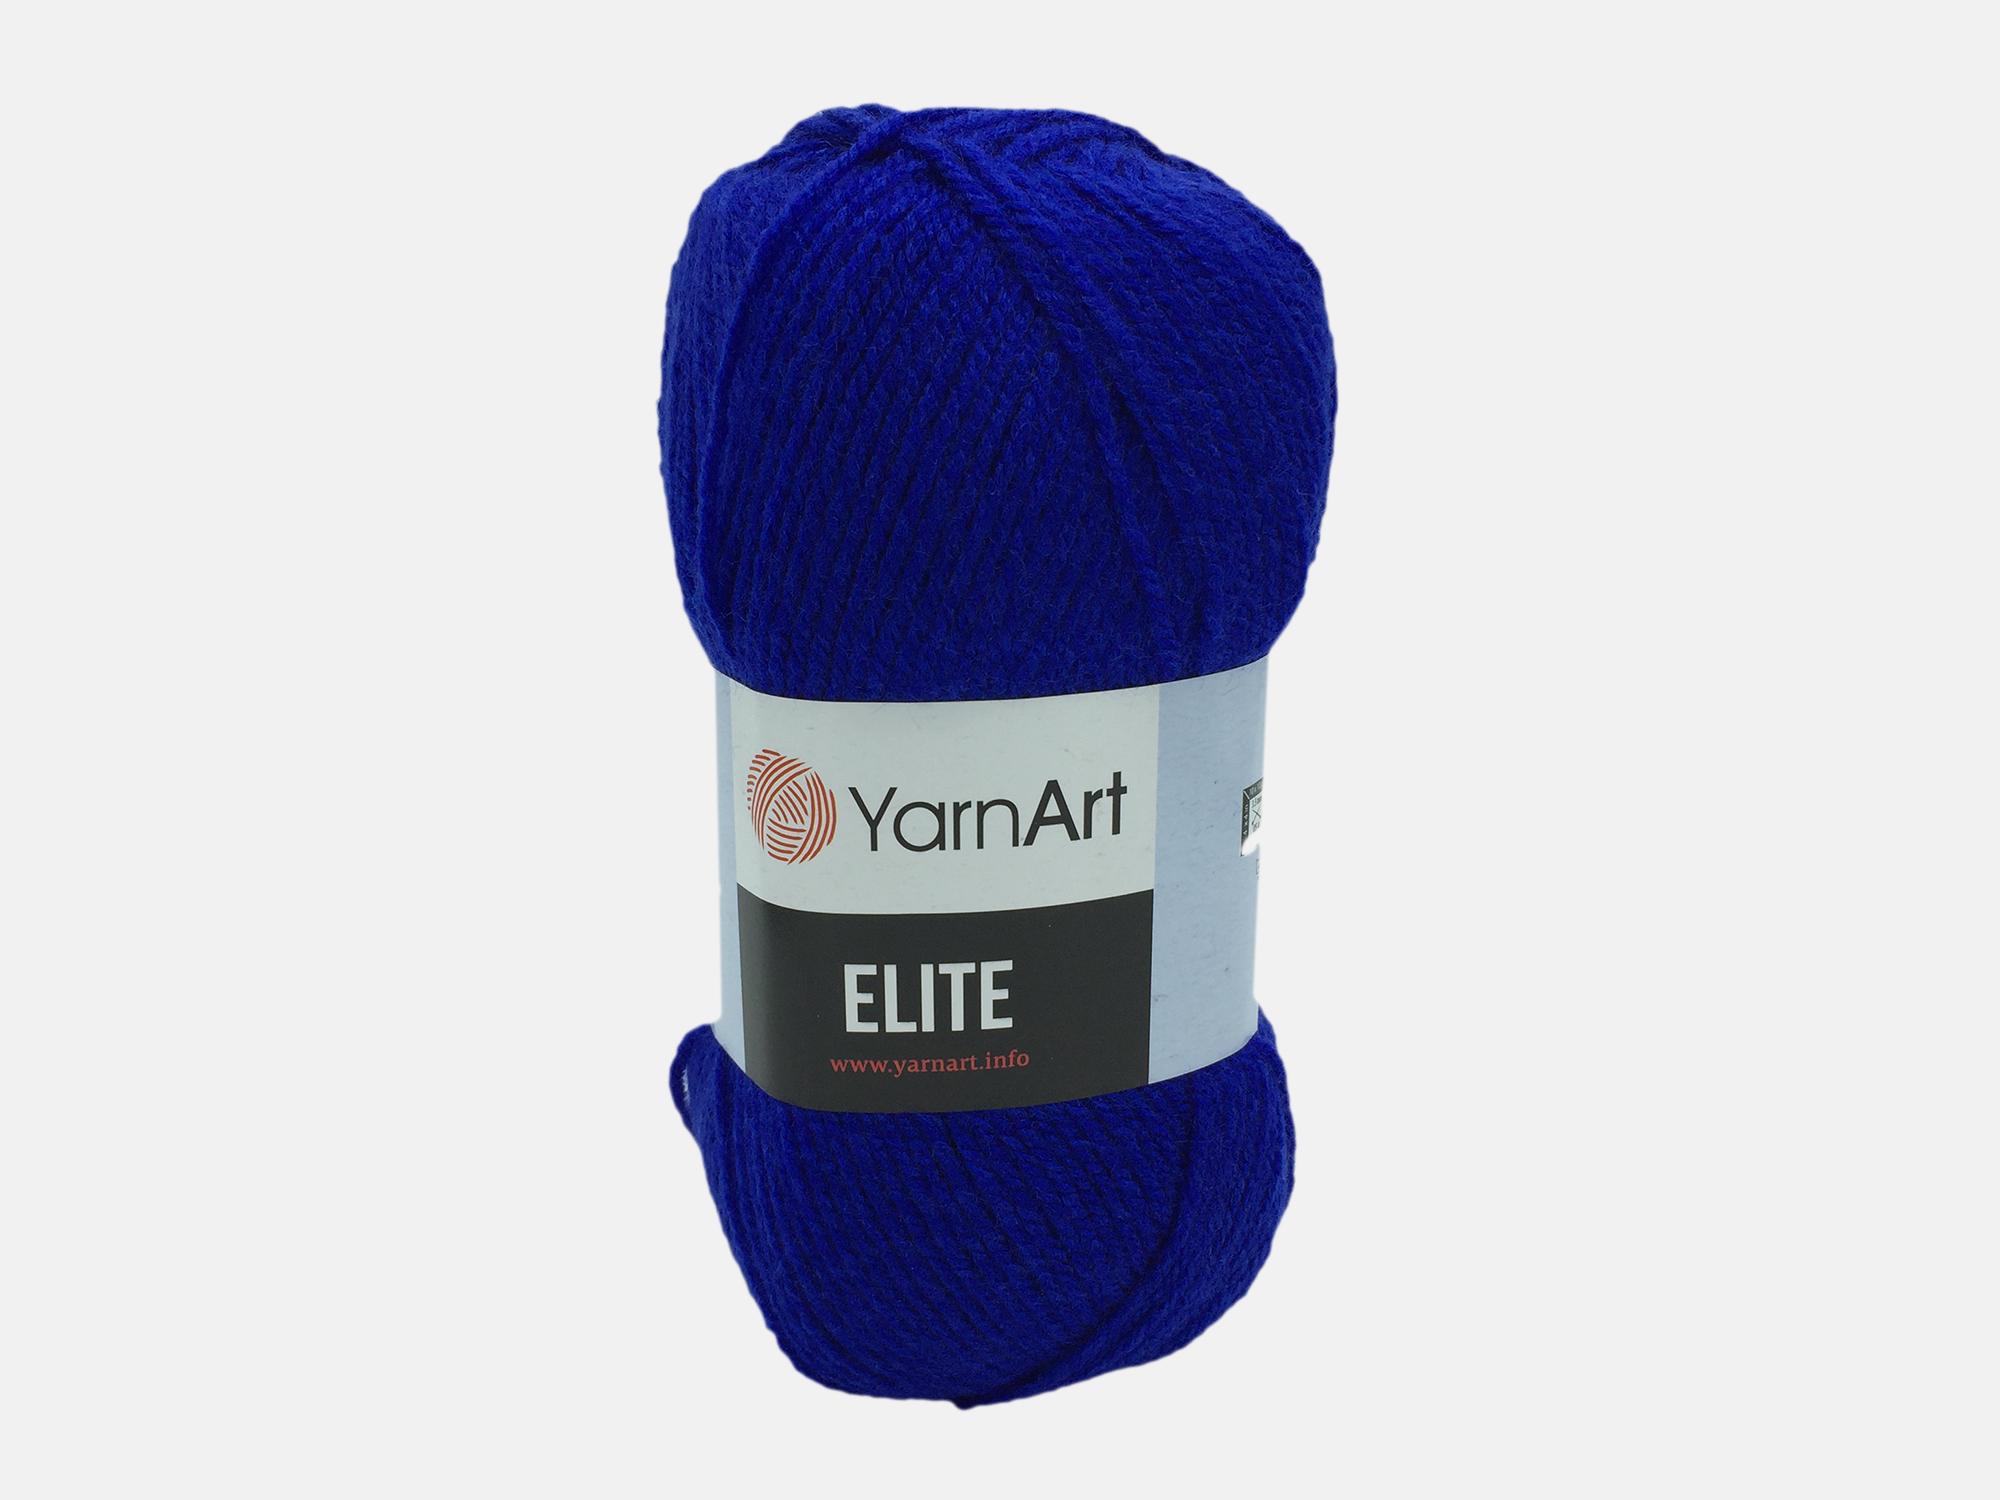 Fire tricotat - ELITE - Albastru - 64 - Yarn-Art